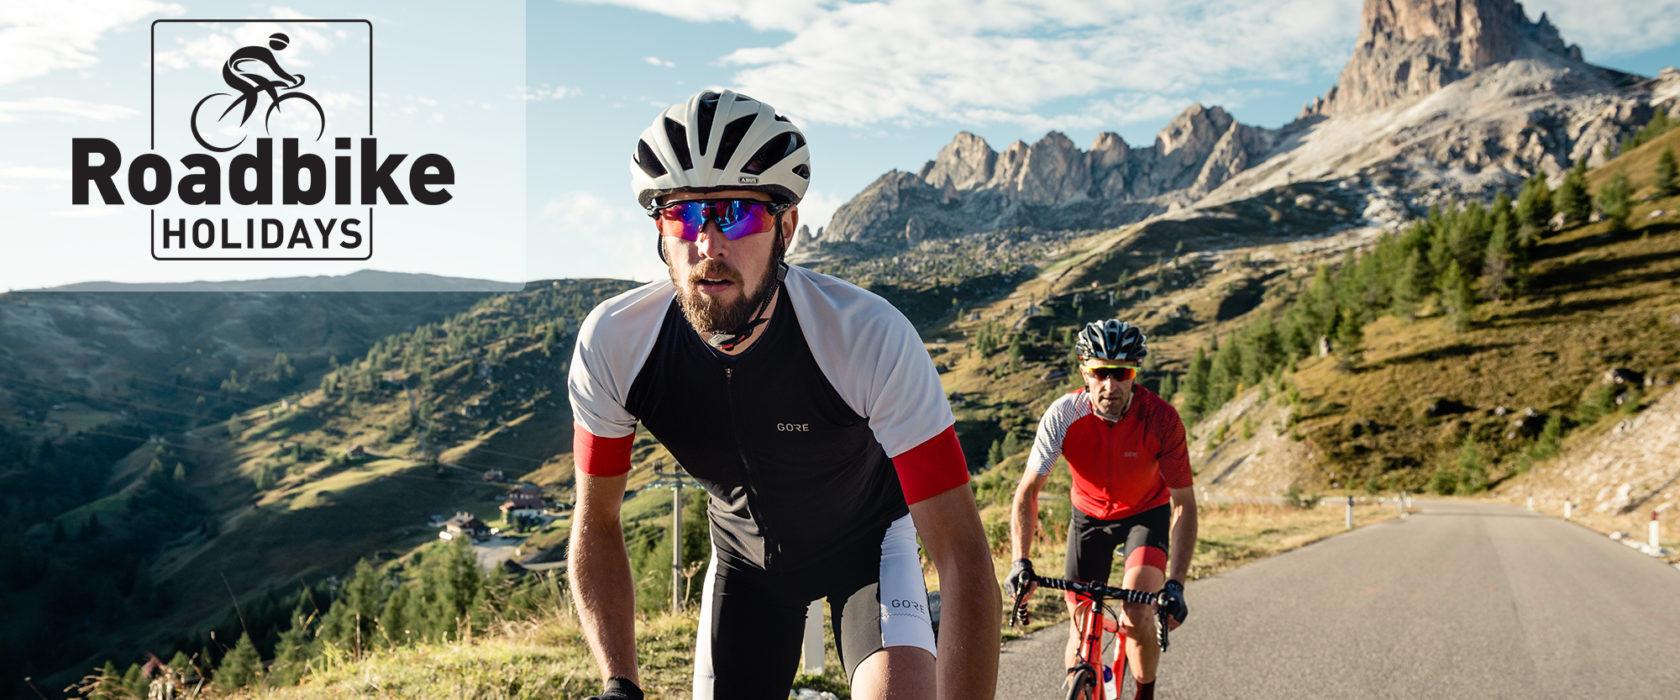 Roadbike Holidays Rennradurlaub